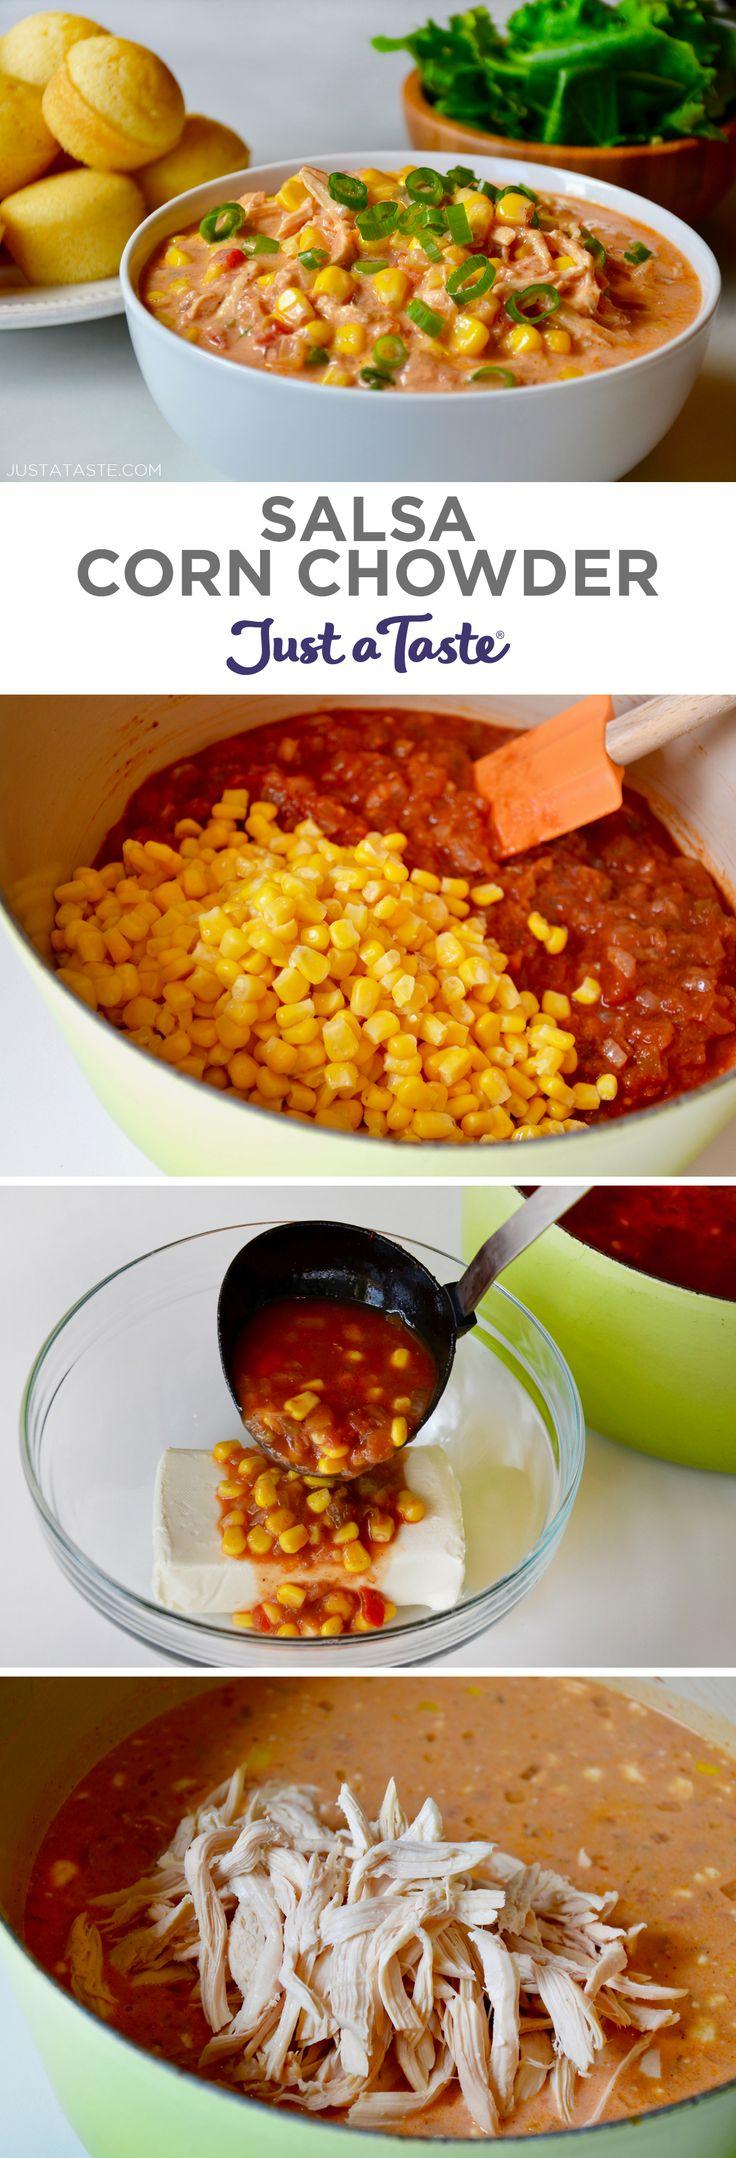 Salsa Corn Chowder recipe from justataste.com #recipes #comfortfood #corn